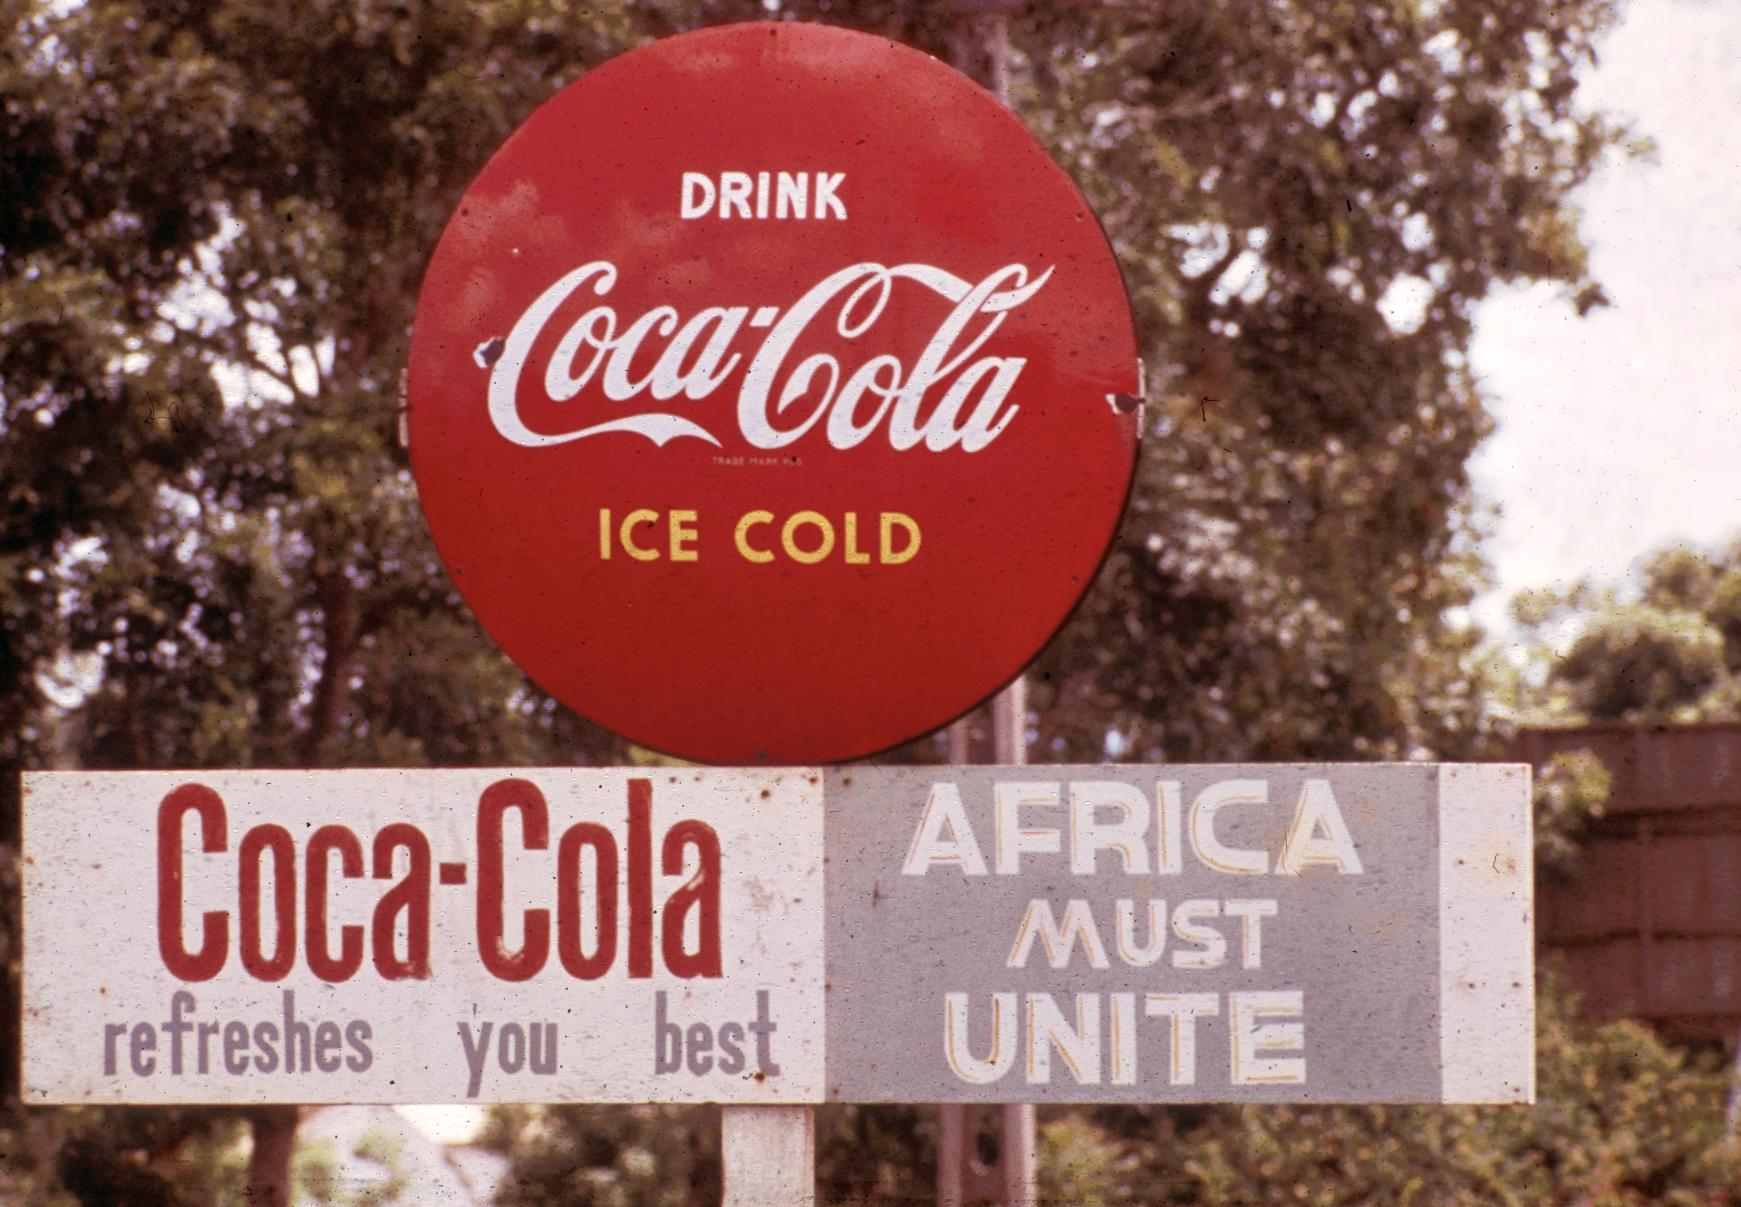 Africa Must Unite Sign on Coca-Cola Billboard